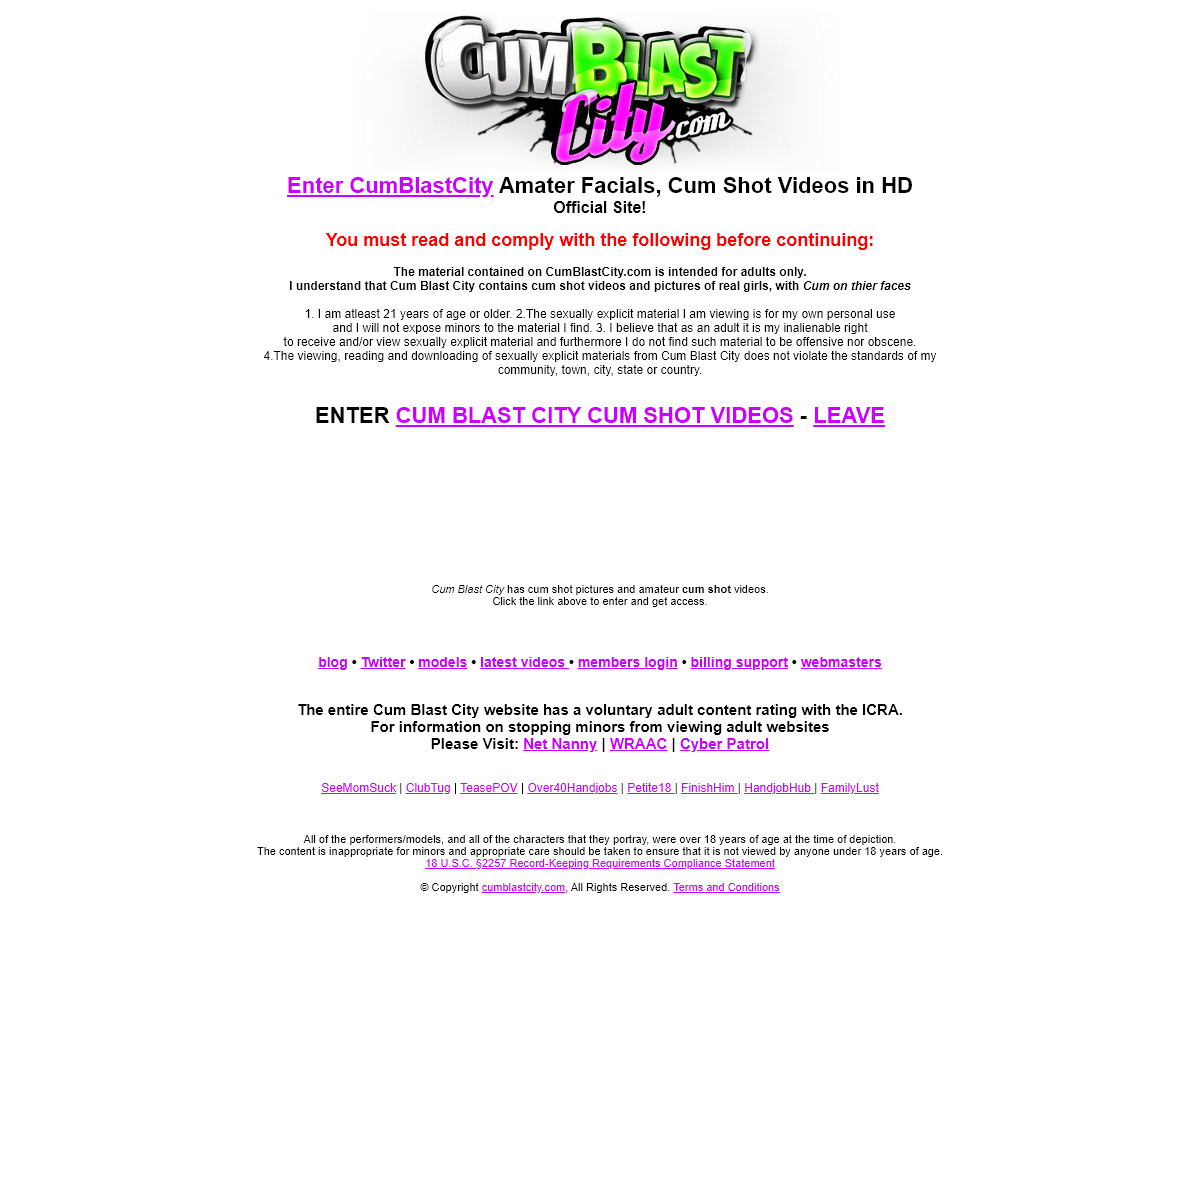 A complete backup of www.www.cumblastcity.com